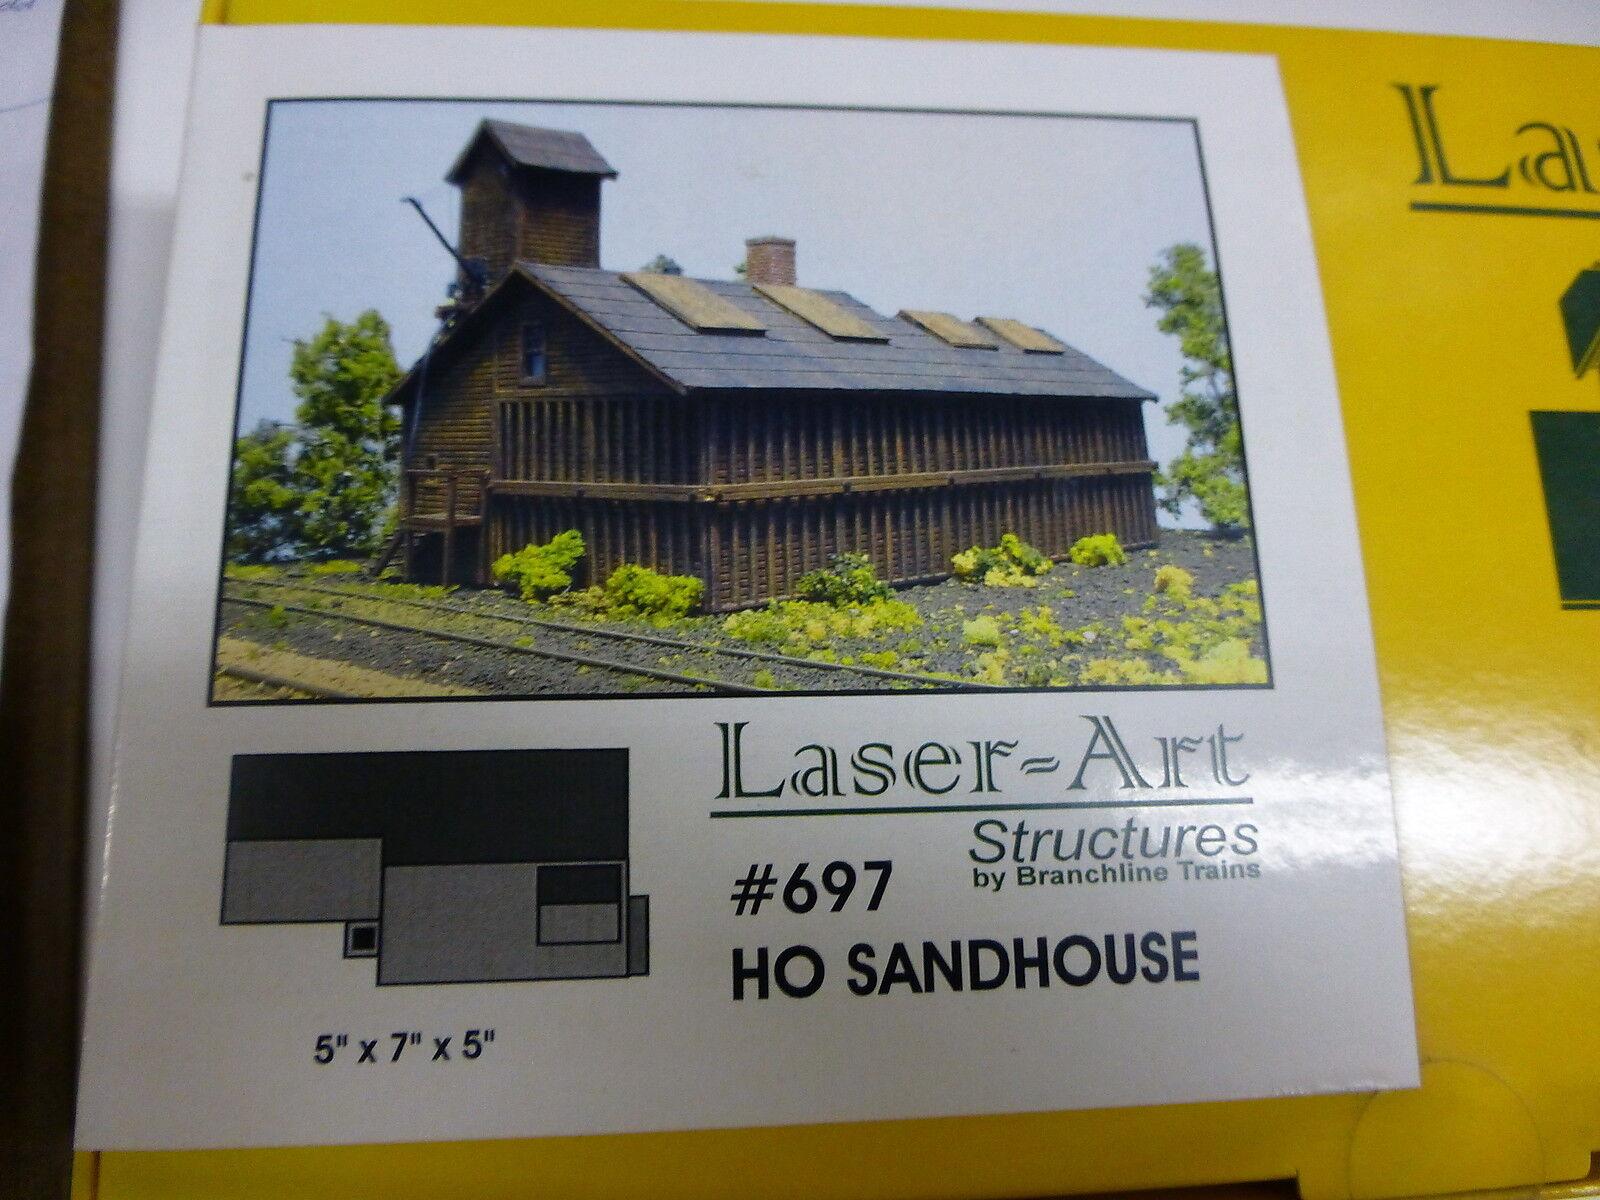 Branchline HO Sandhouse 5  x 7  x 5  (Laser Art Kit)